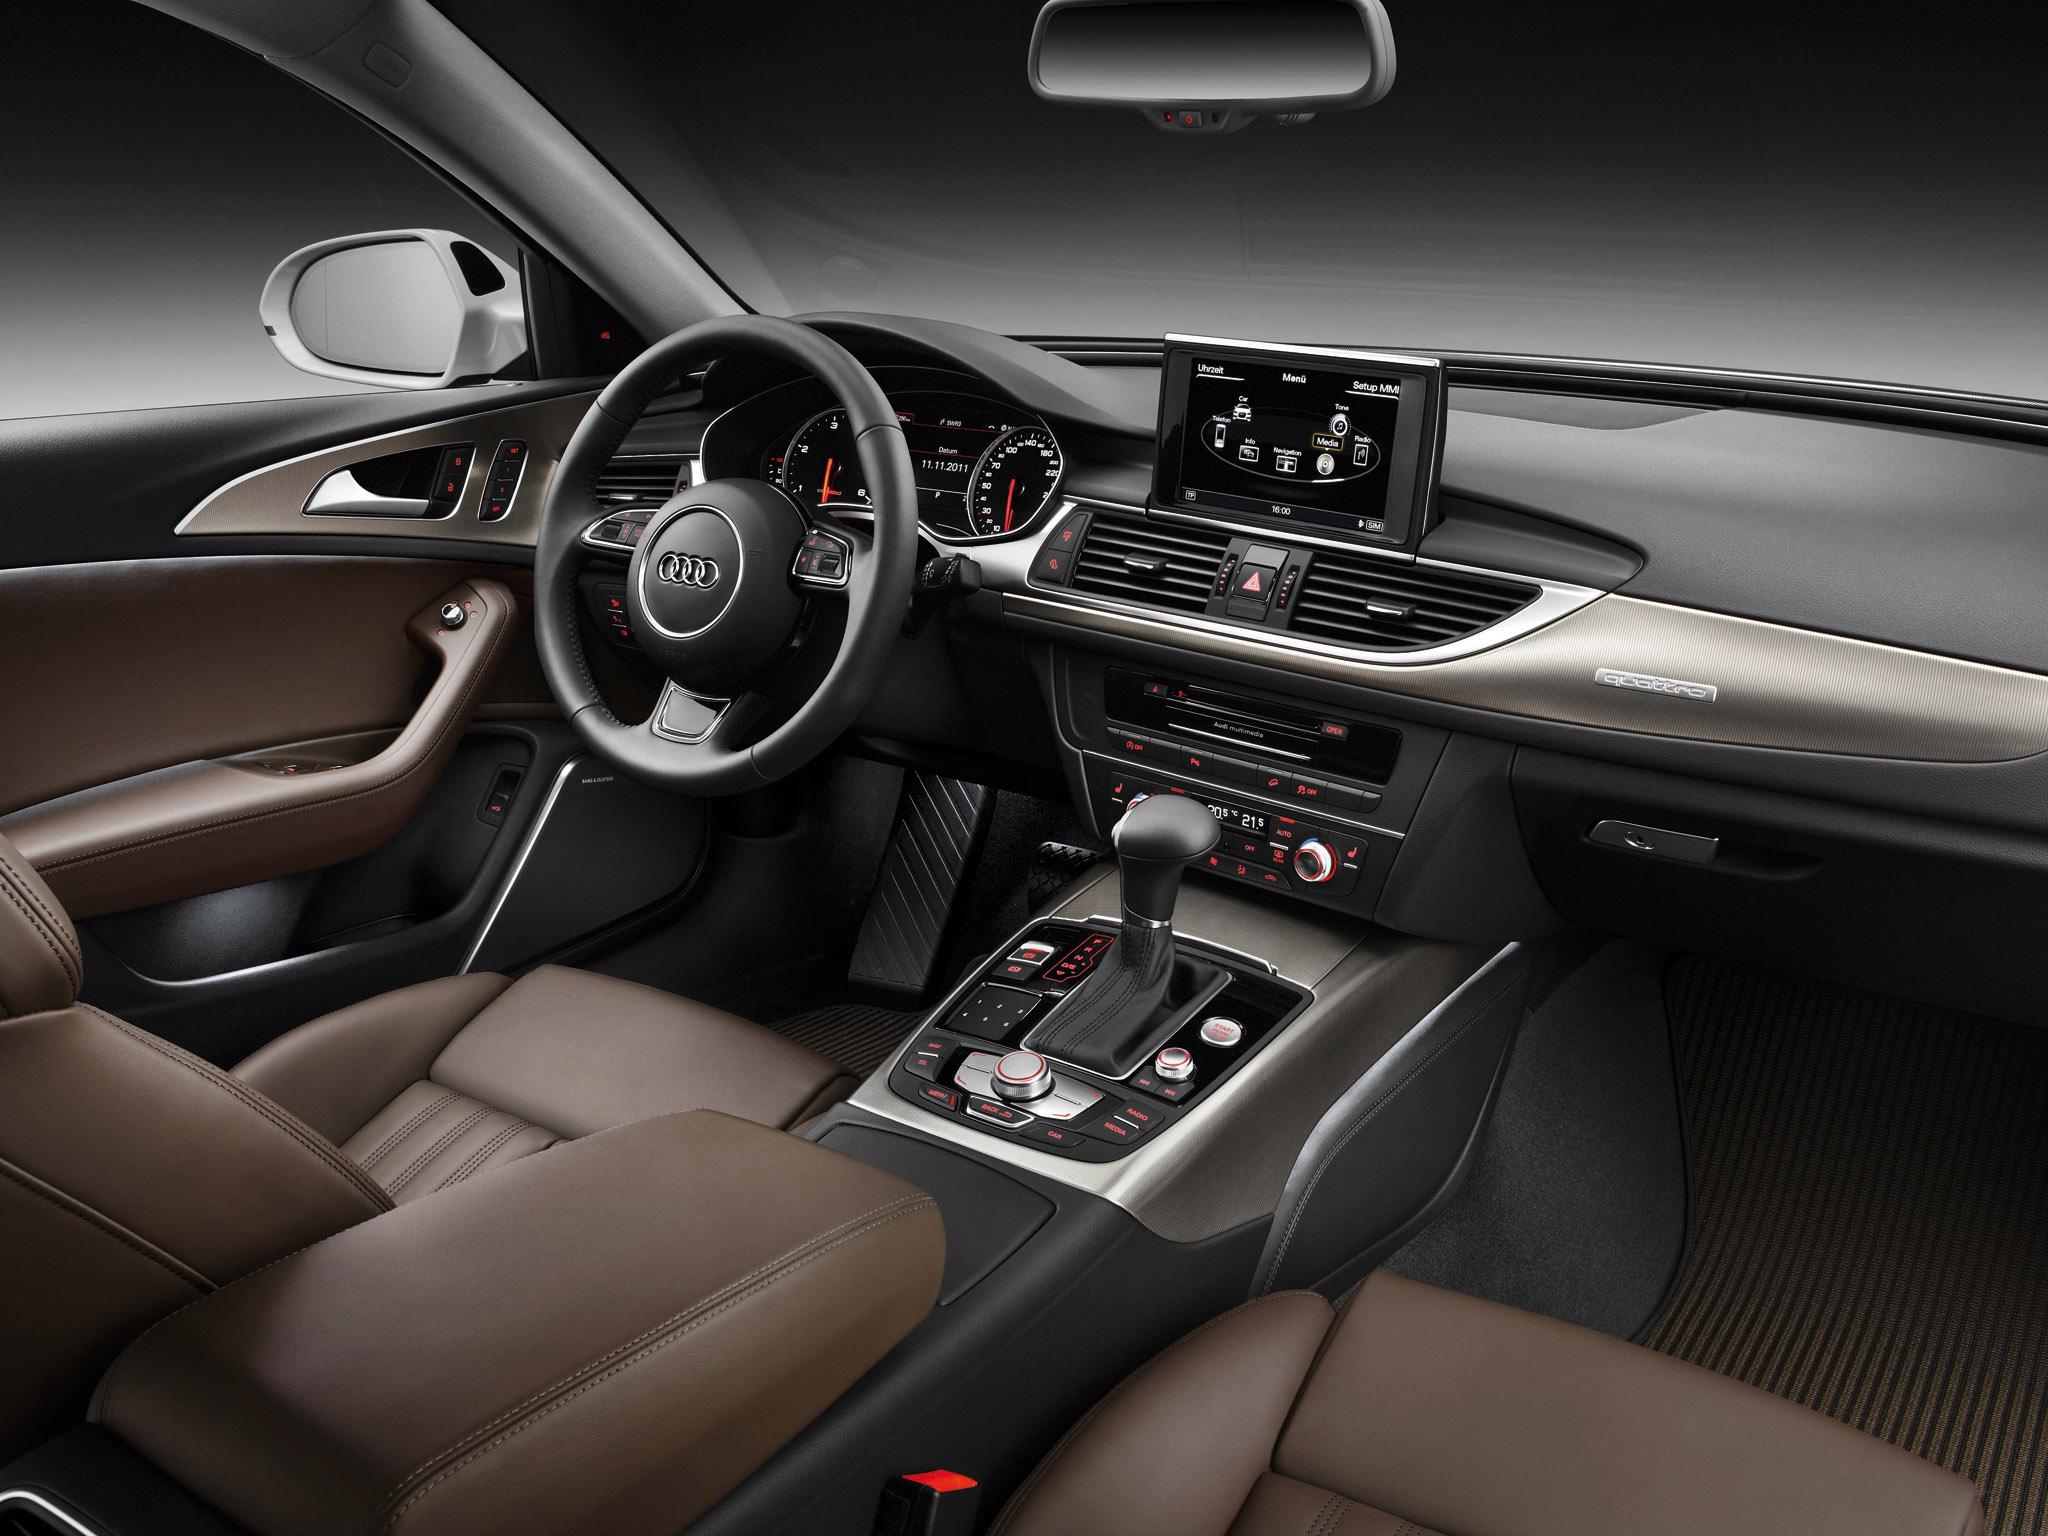 Audi A6 Allroad 3 0 Tdi Quattro 2012 Audi A6 Allroad 3 0